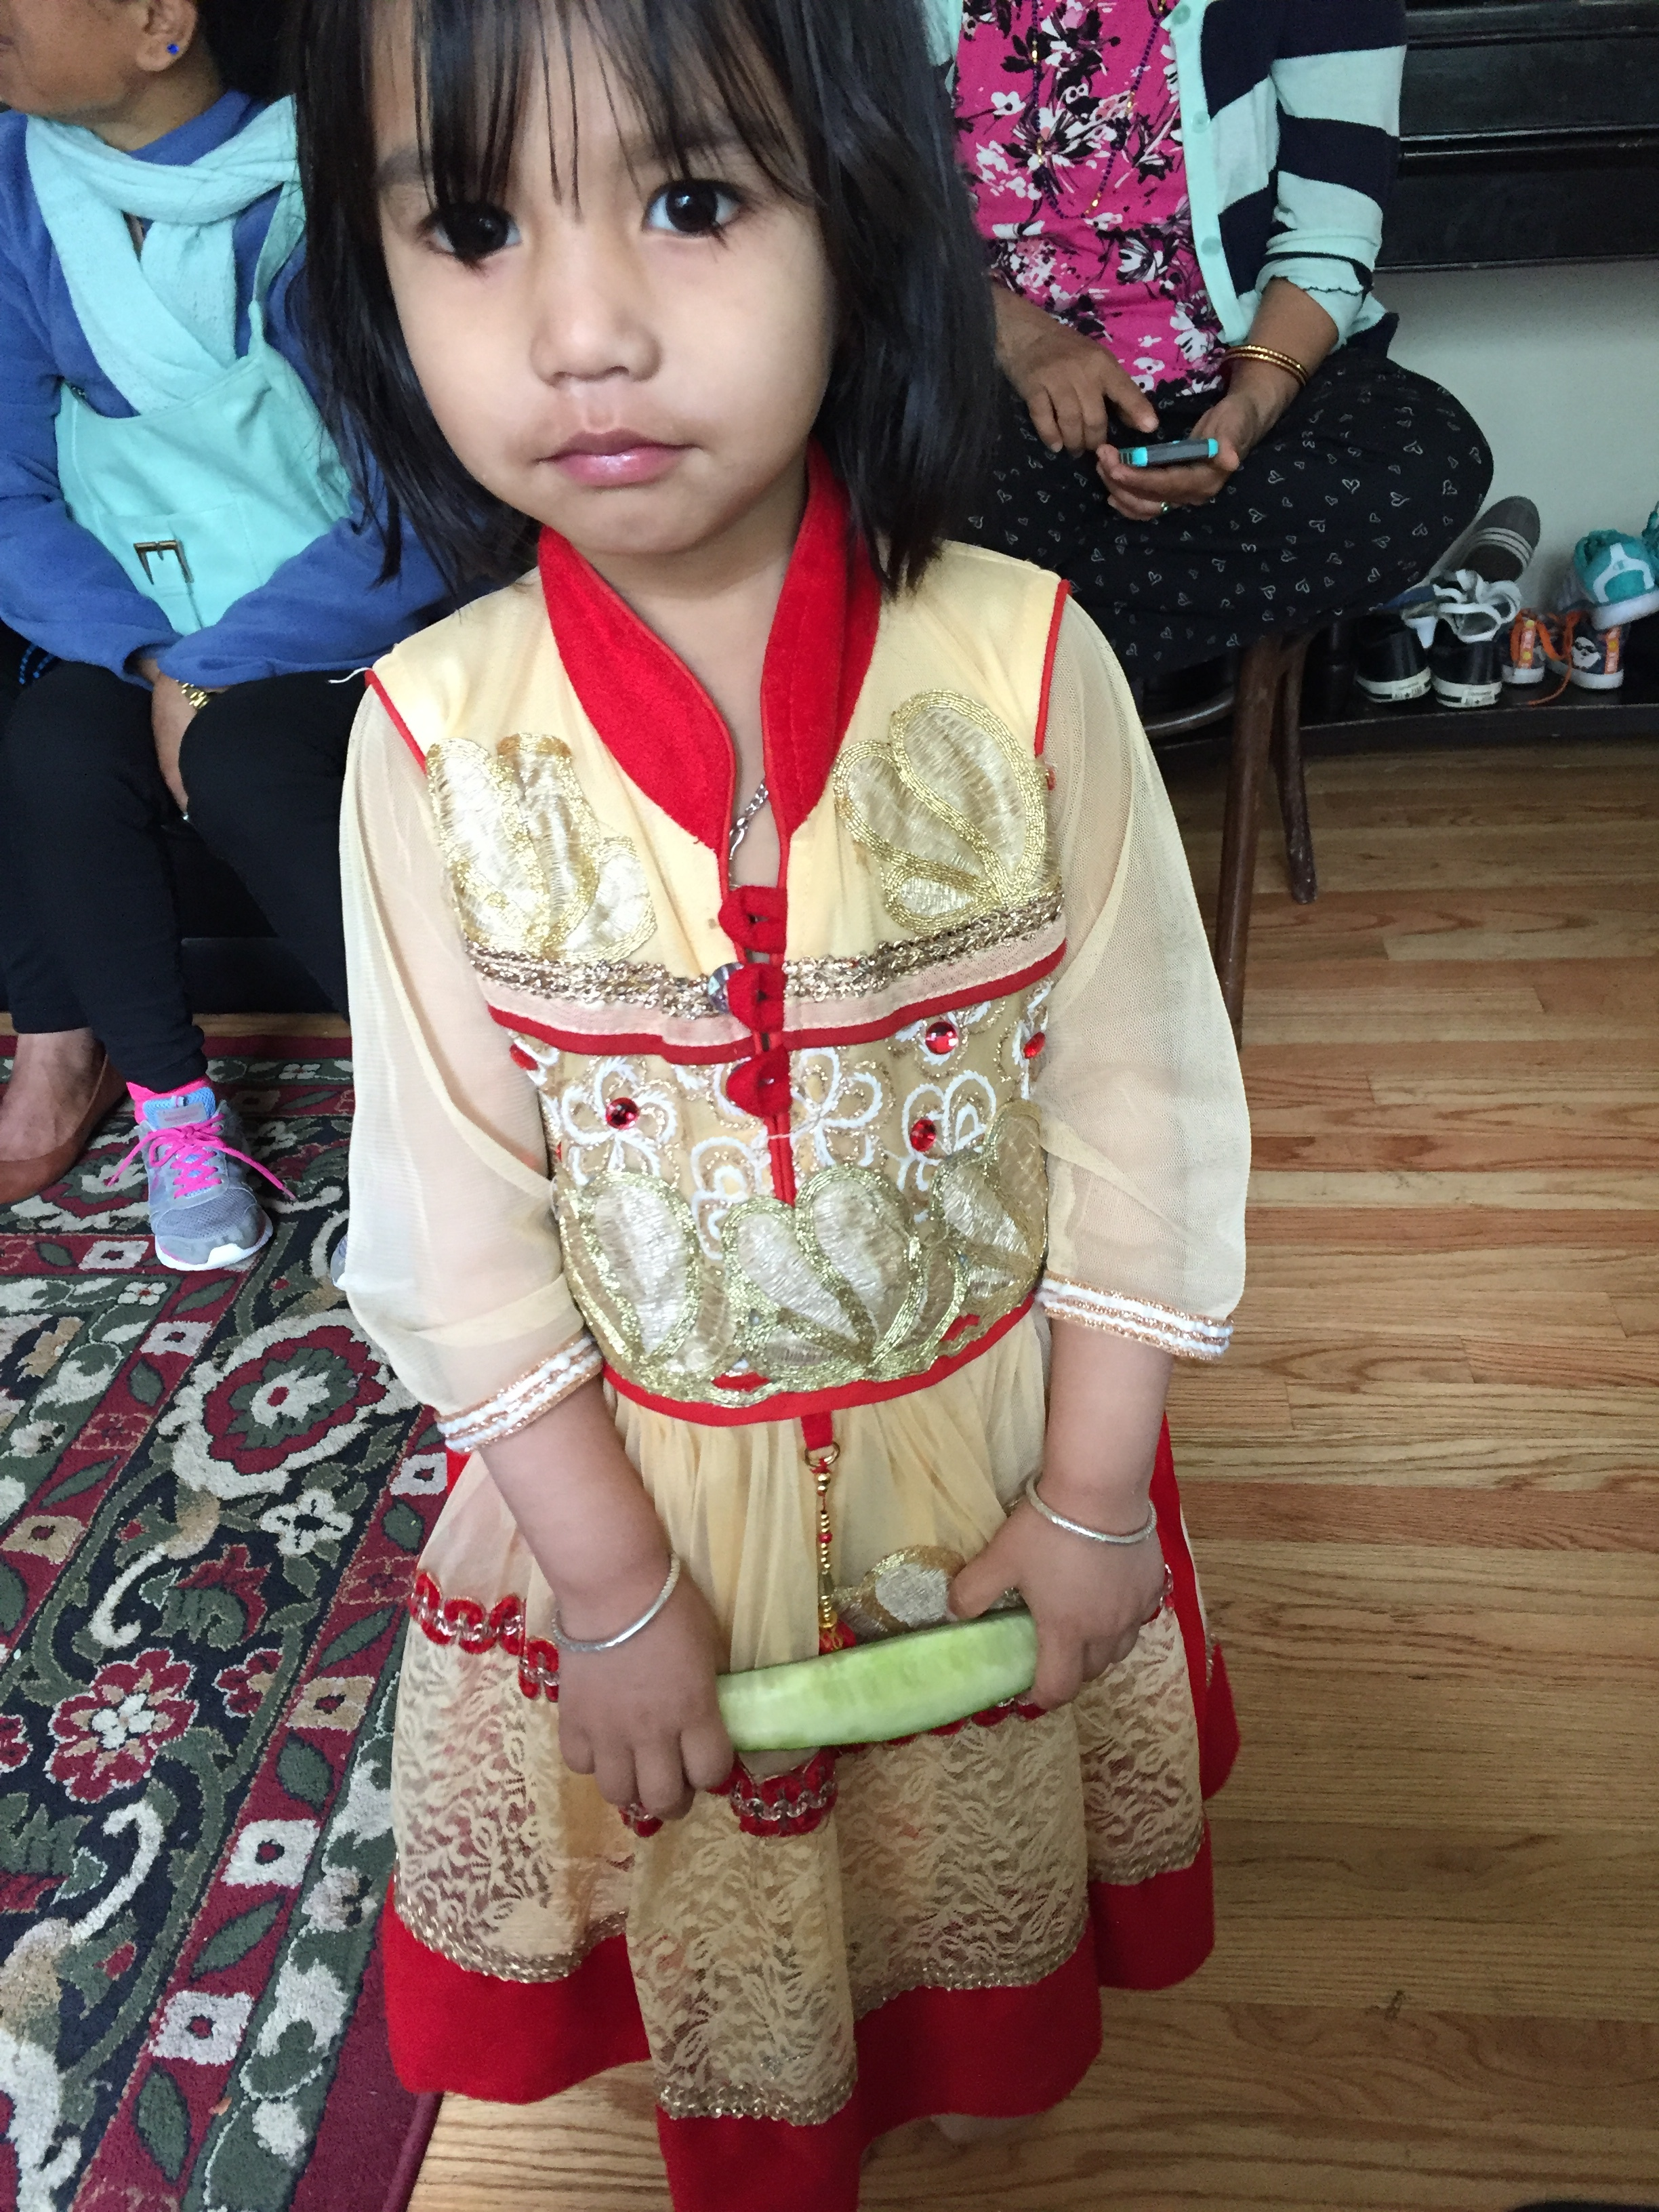 Chandra's daughter, Evangelina.